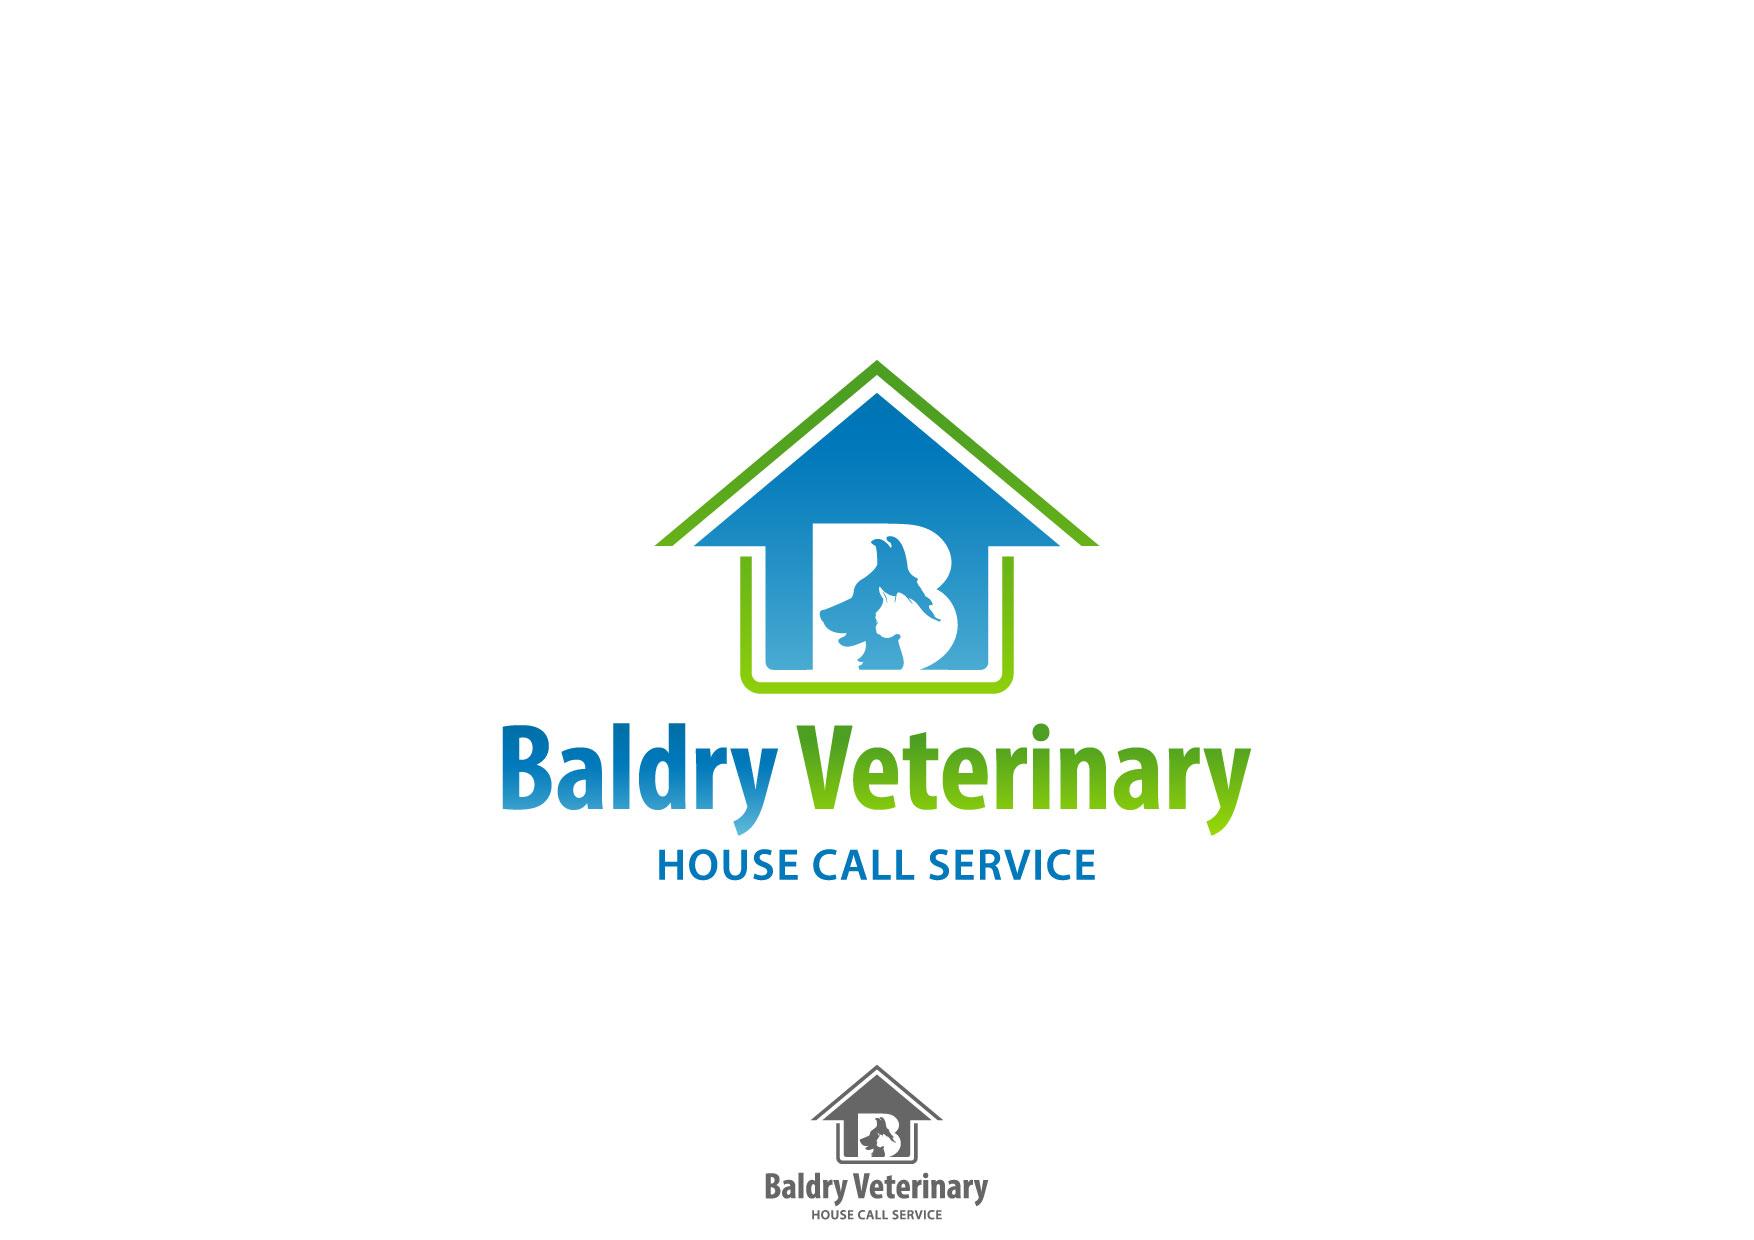 Logo Design by Nurgalih Destianto - Entry No. 120 in the Logo Design Contest Captivating Logo Design for Baldry Veterinary House Call Service.